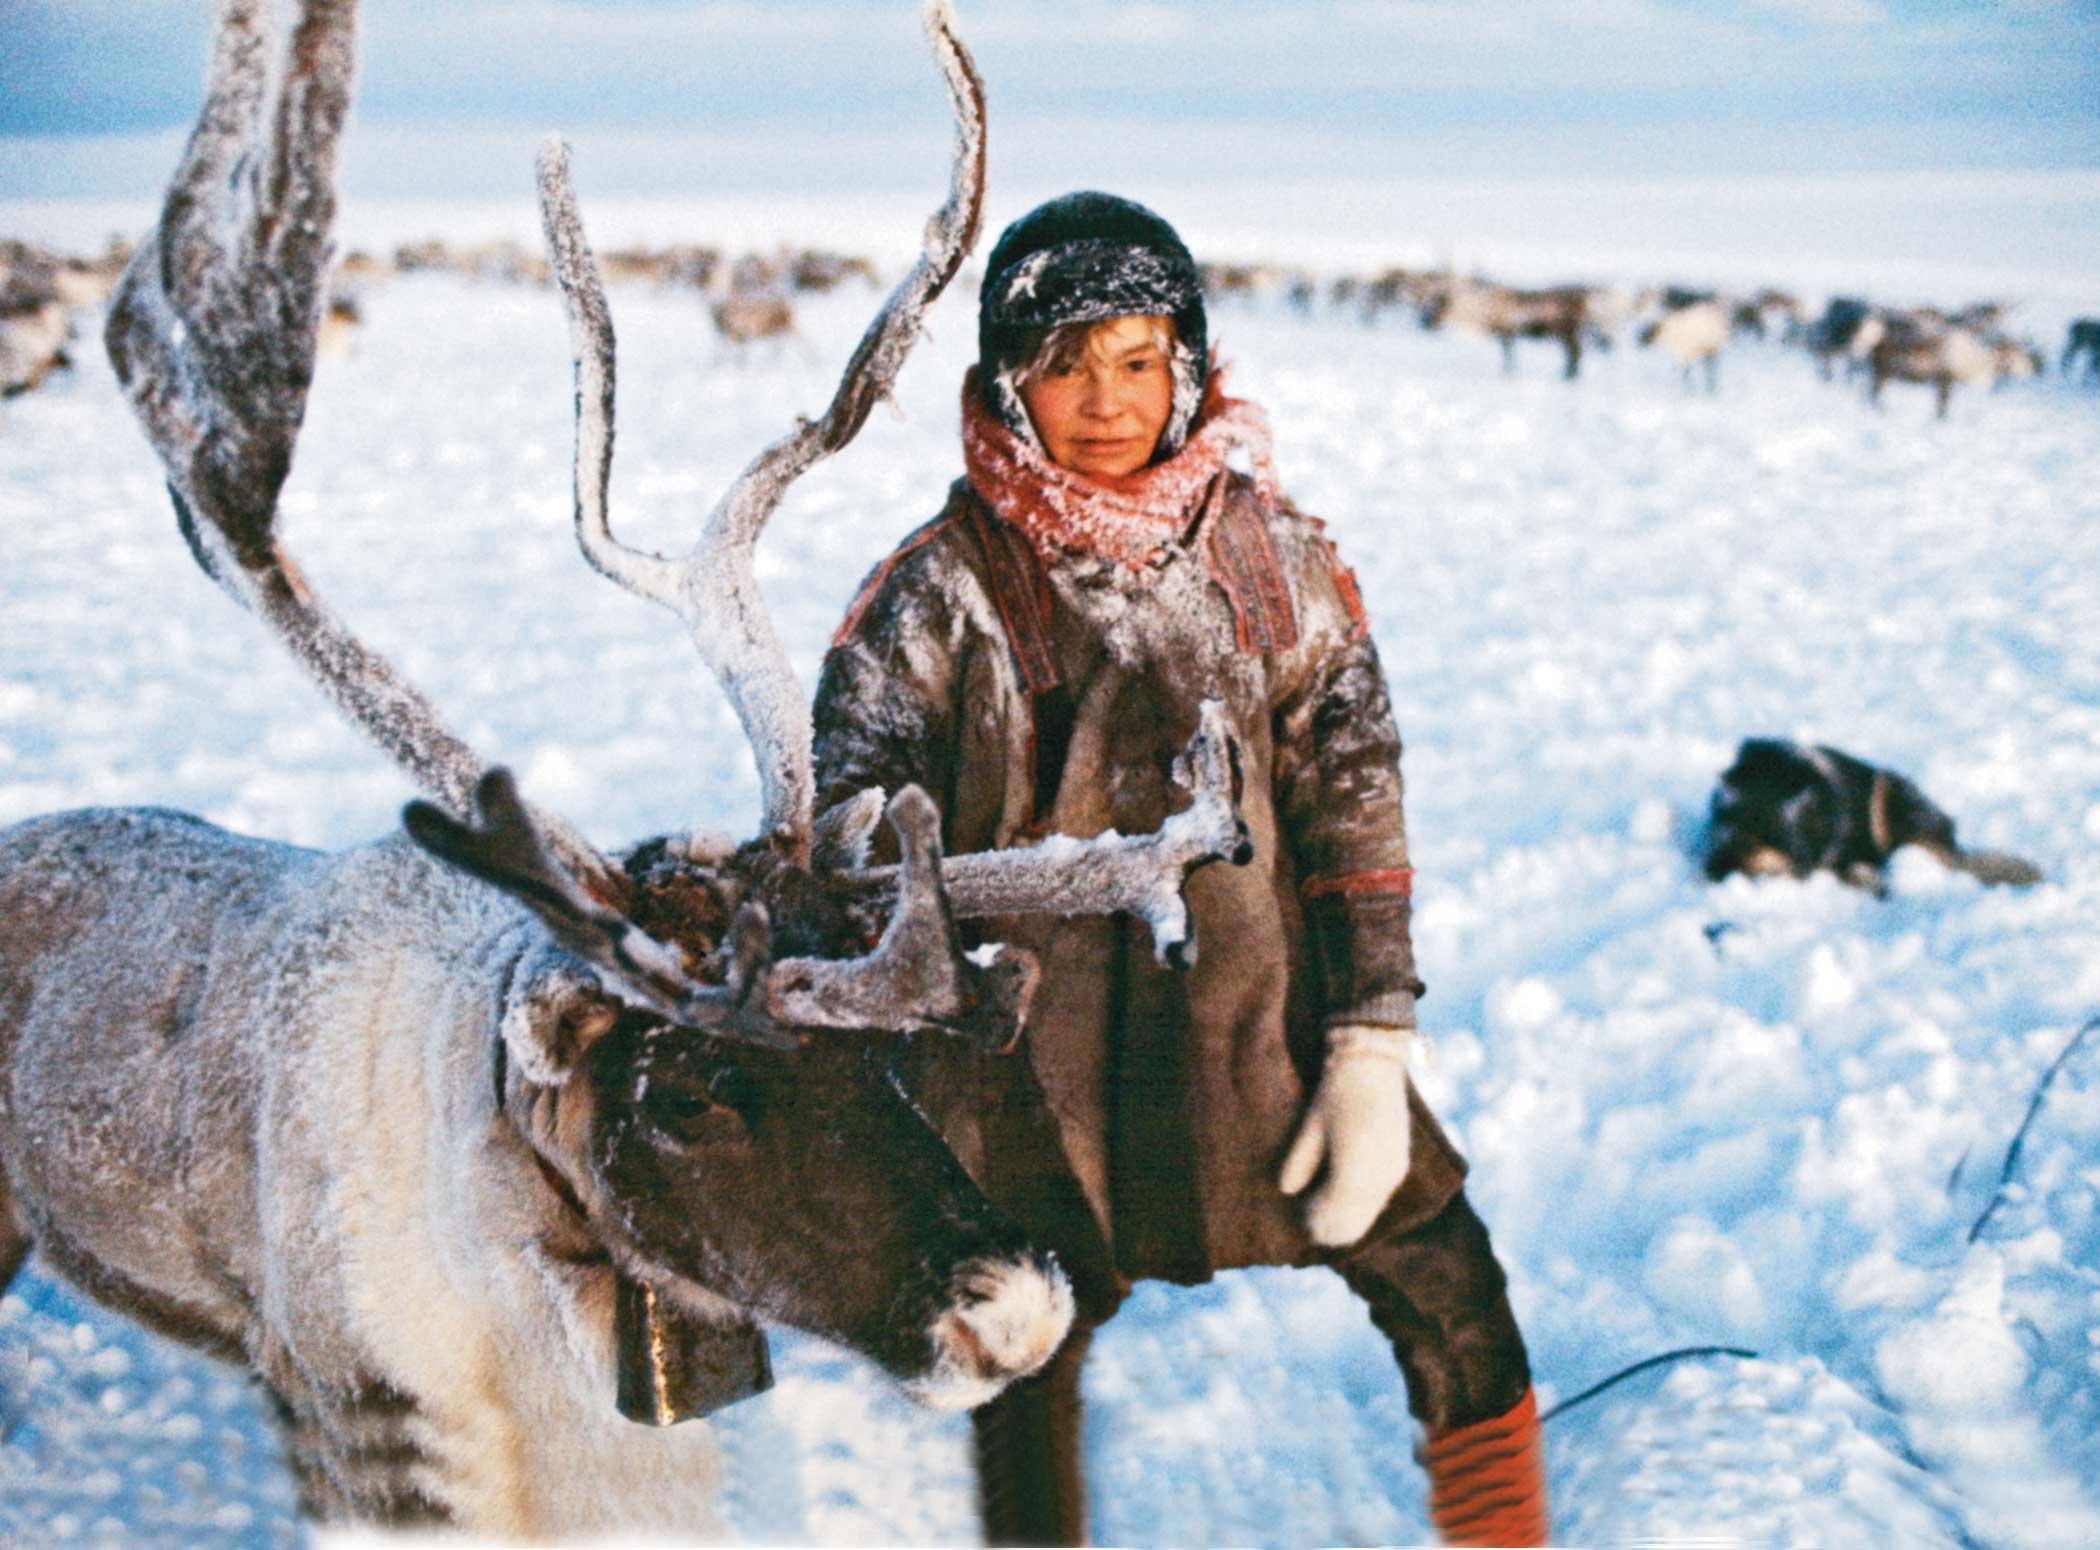 HD Quality Wallpaper | Collection: Artistic, 2100x1550 Eskimo